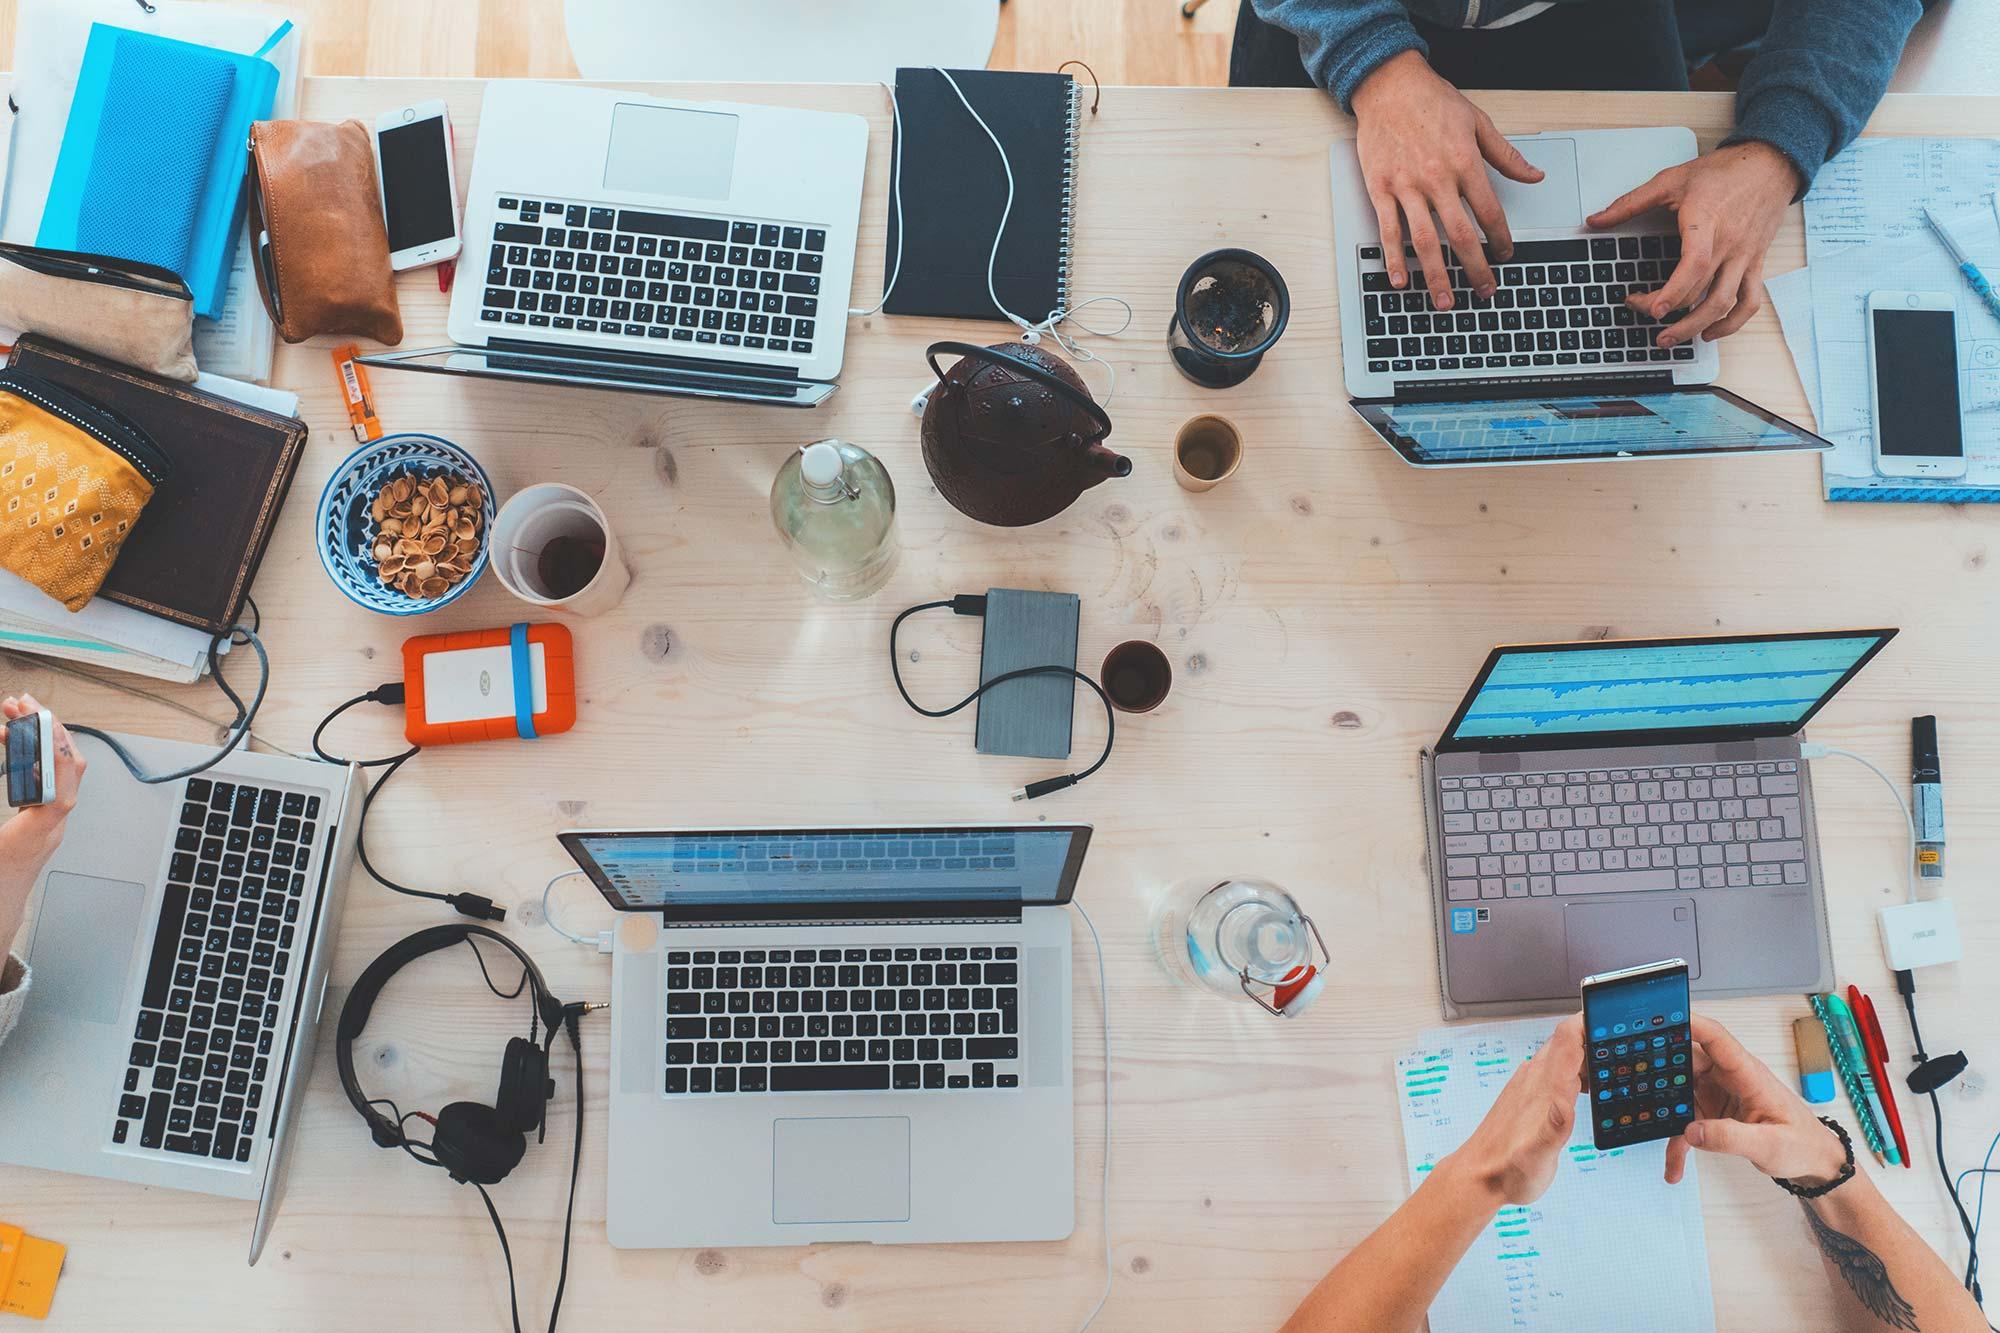 team around computers at work